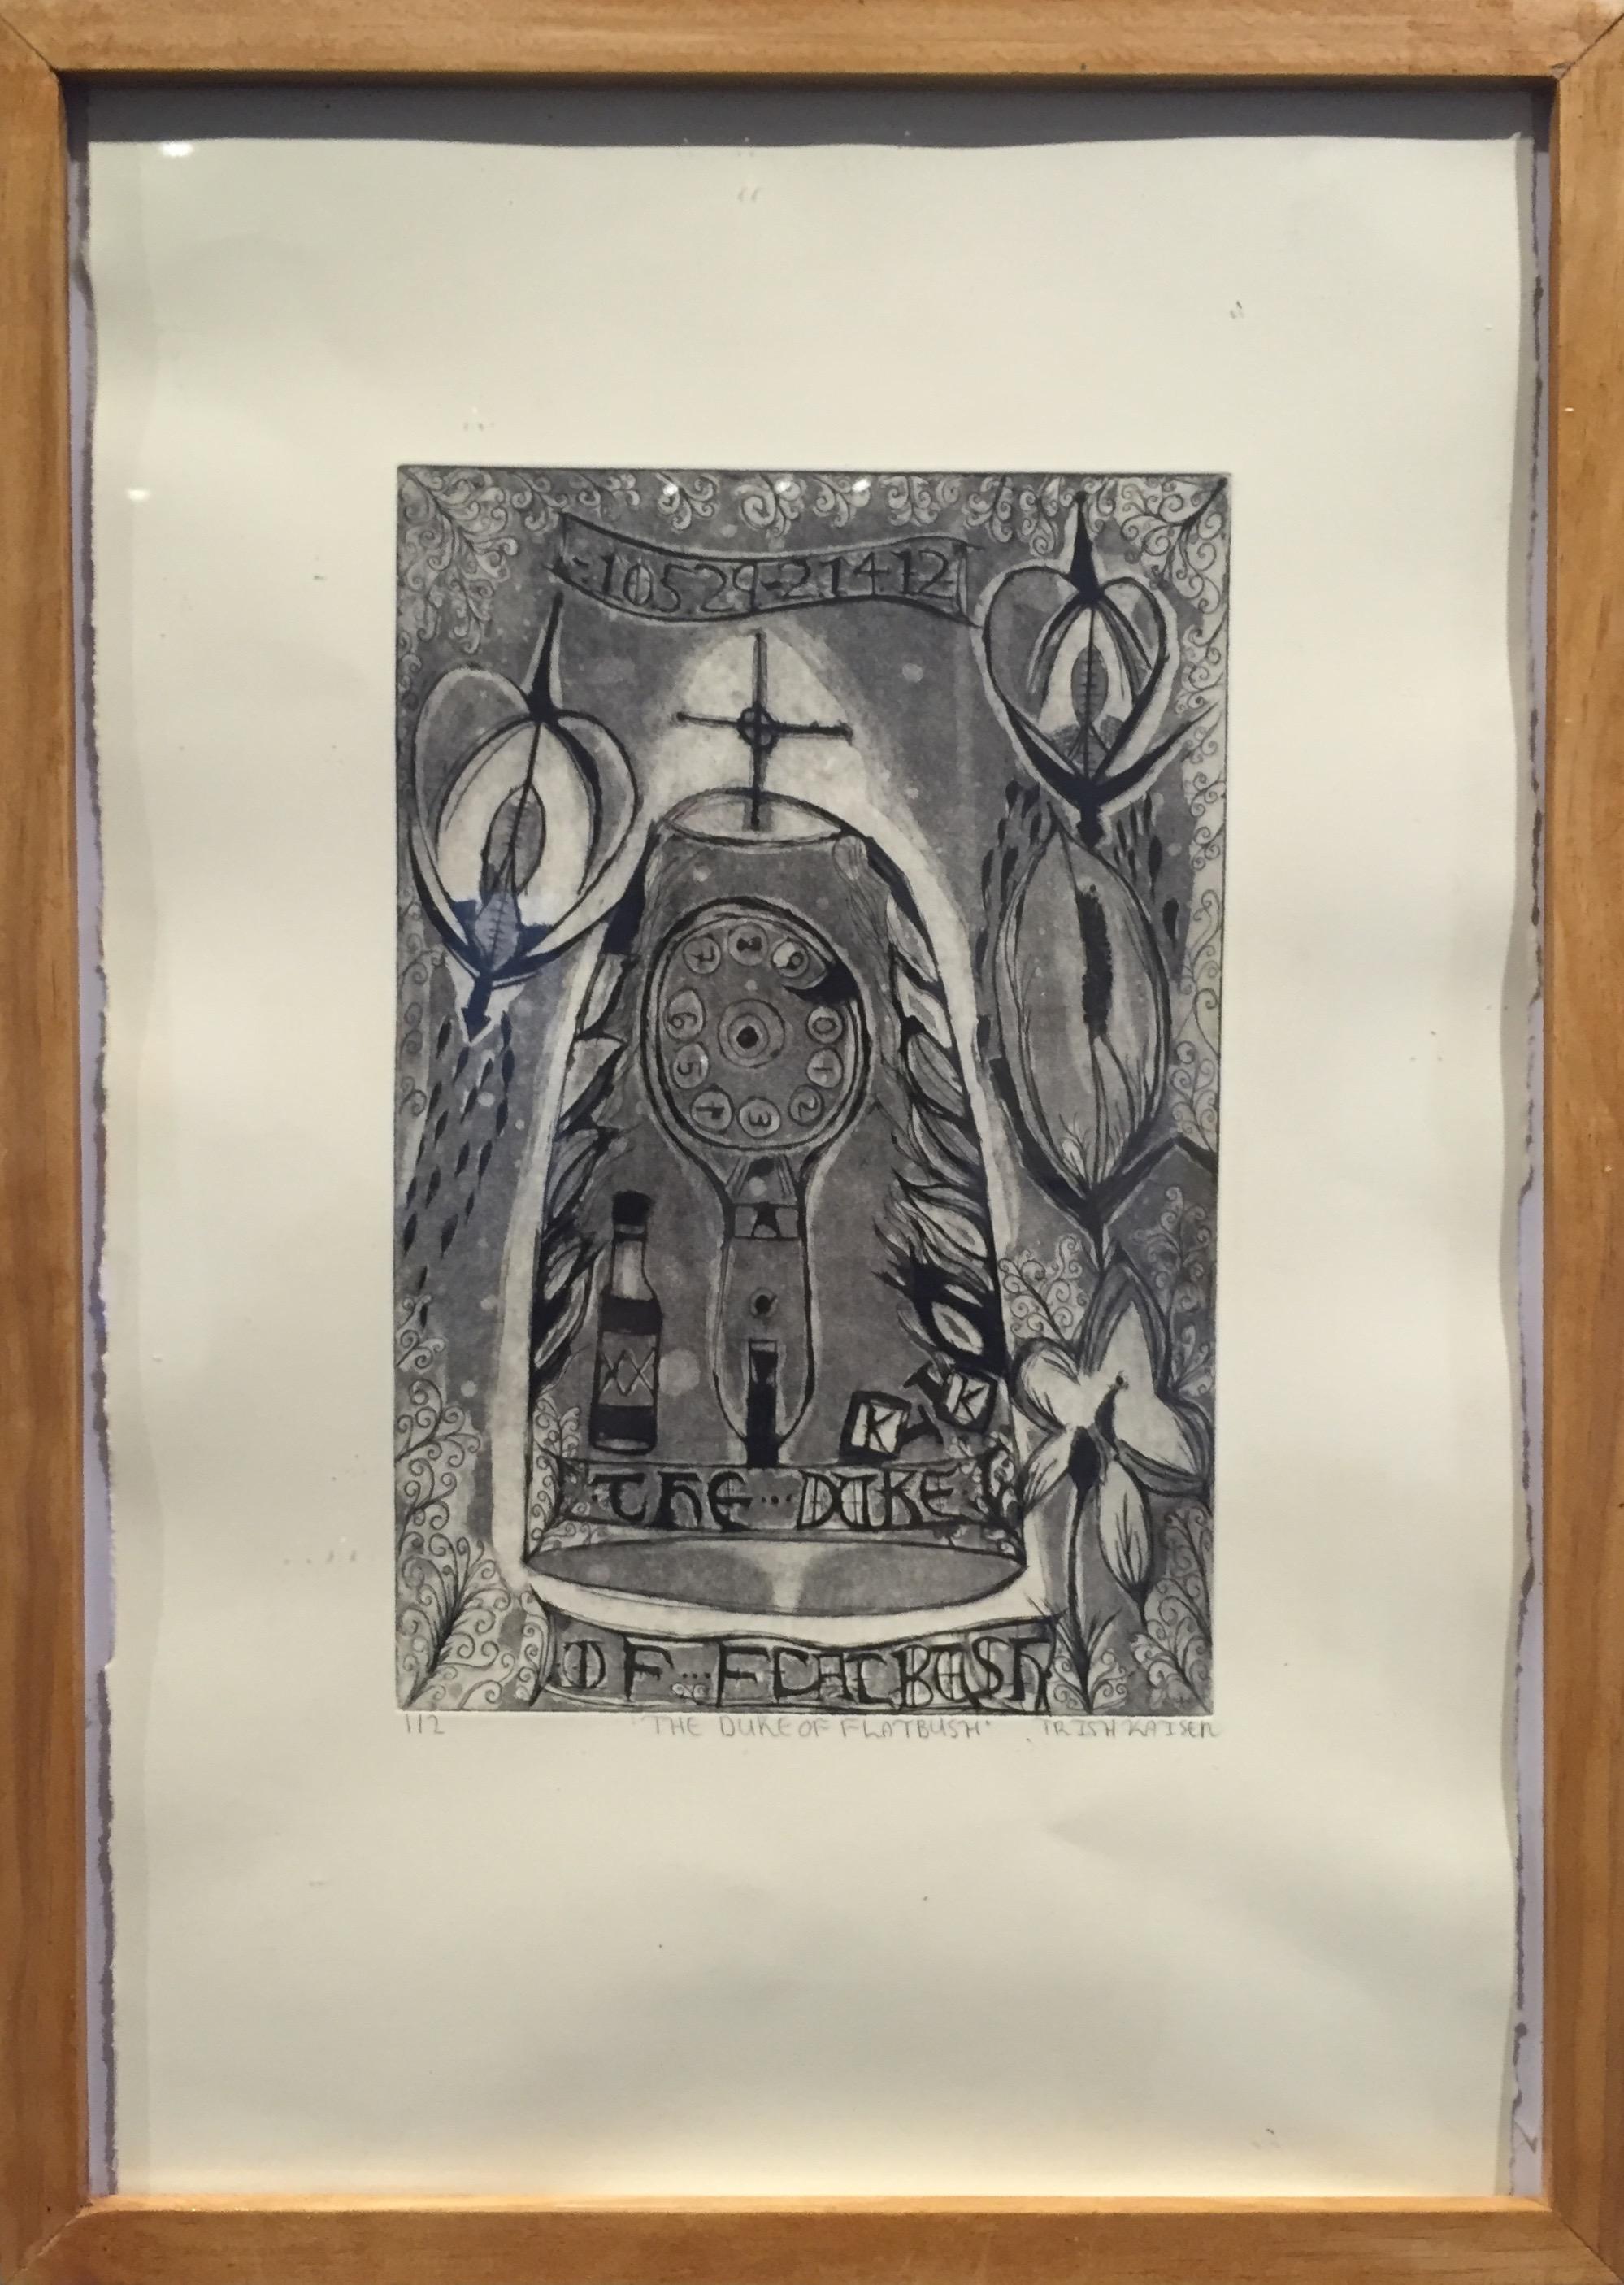 TRISH KAISER The Duke of Flatbush etching, aquatint